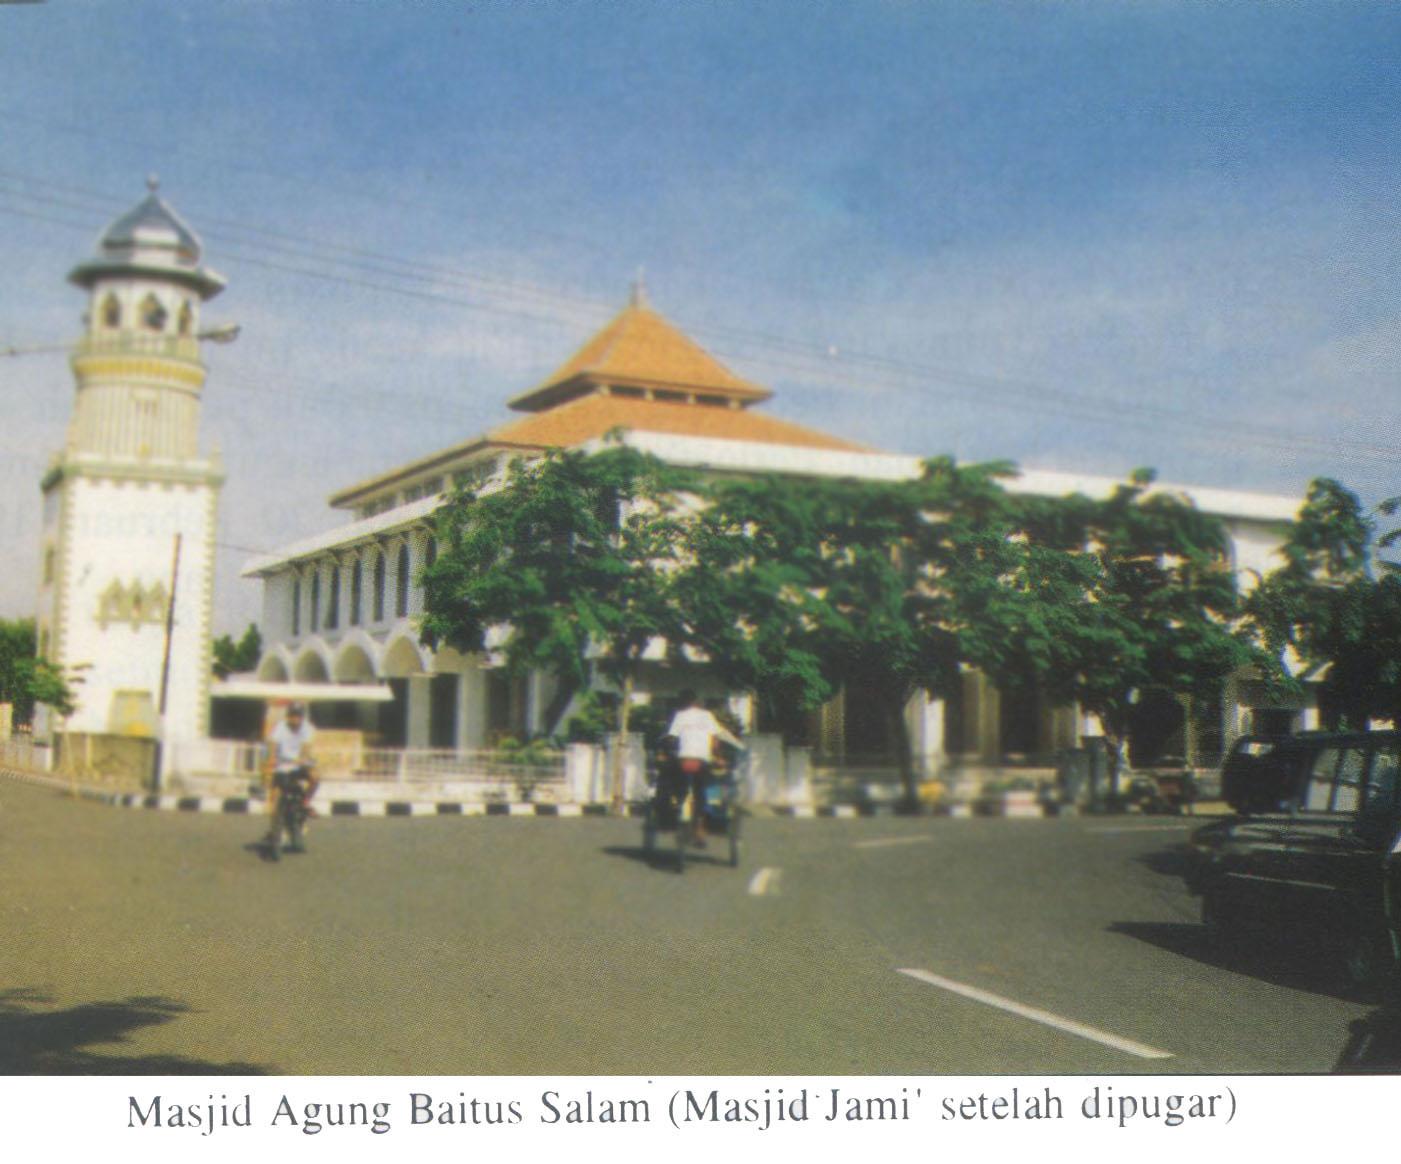 Masjid Agung Baitus Salam Kabupaten Nganjuk Pusaka Jawatimuran Kediri Kab